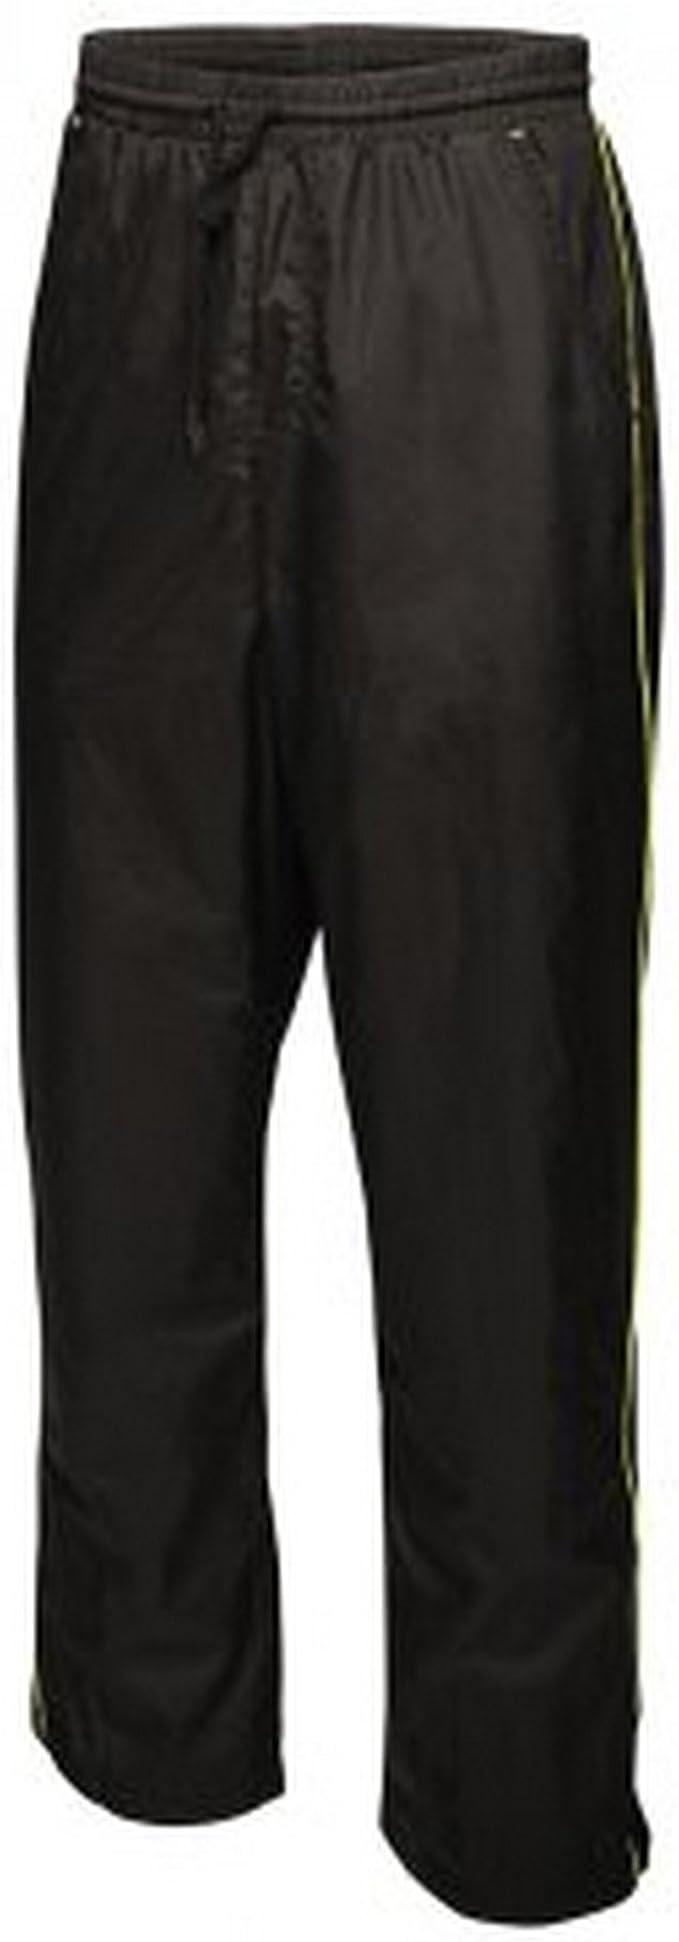 Regatta Activewear Athens Tracksuit Bottoms